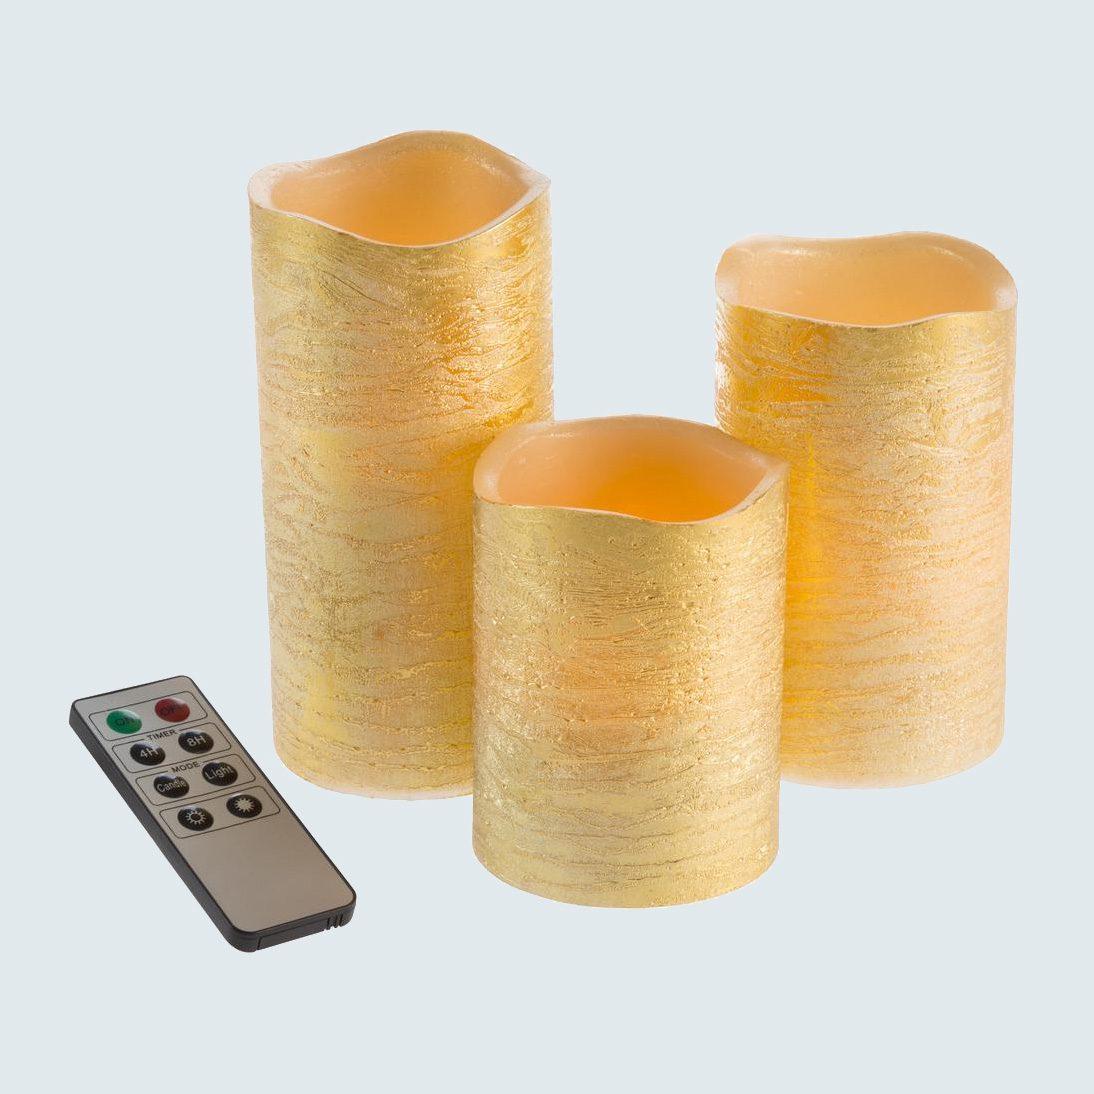 Lavish Home Distressed Metallic Gold LED Candles